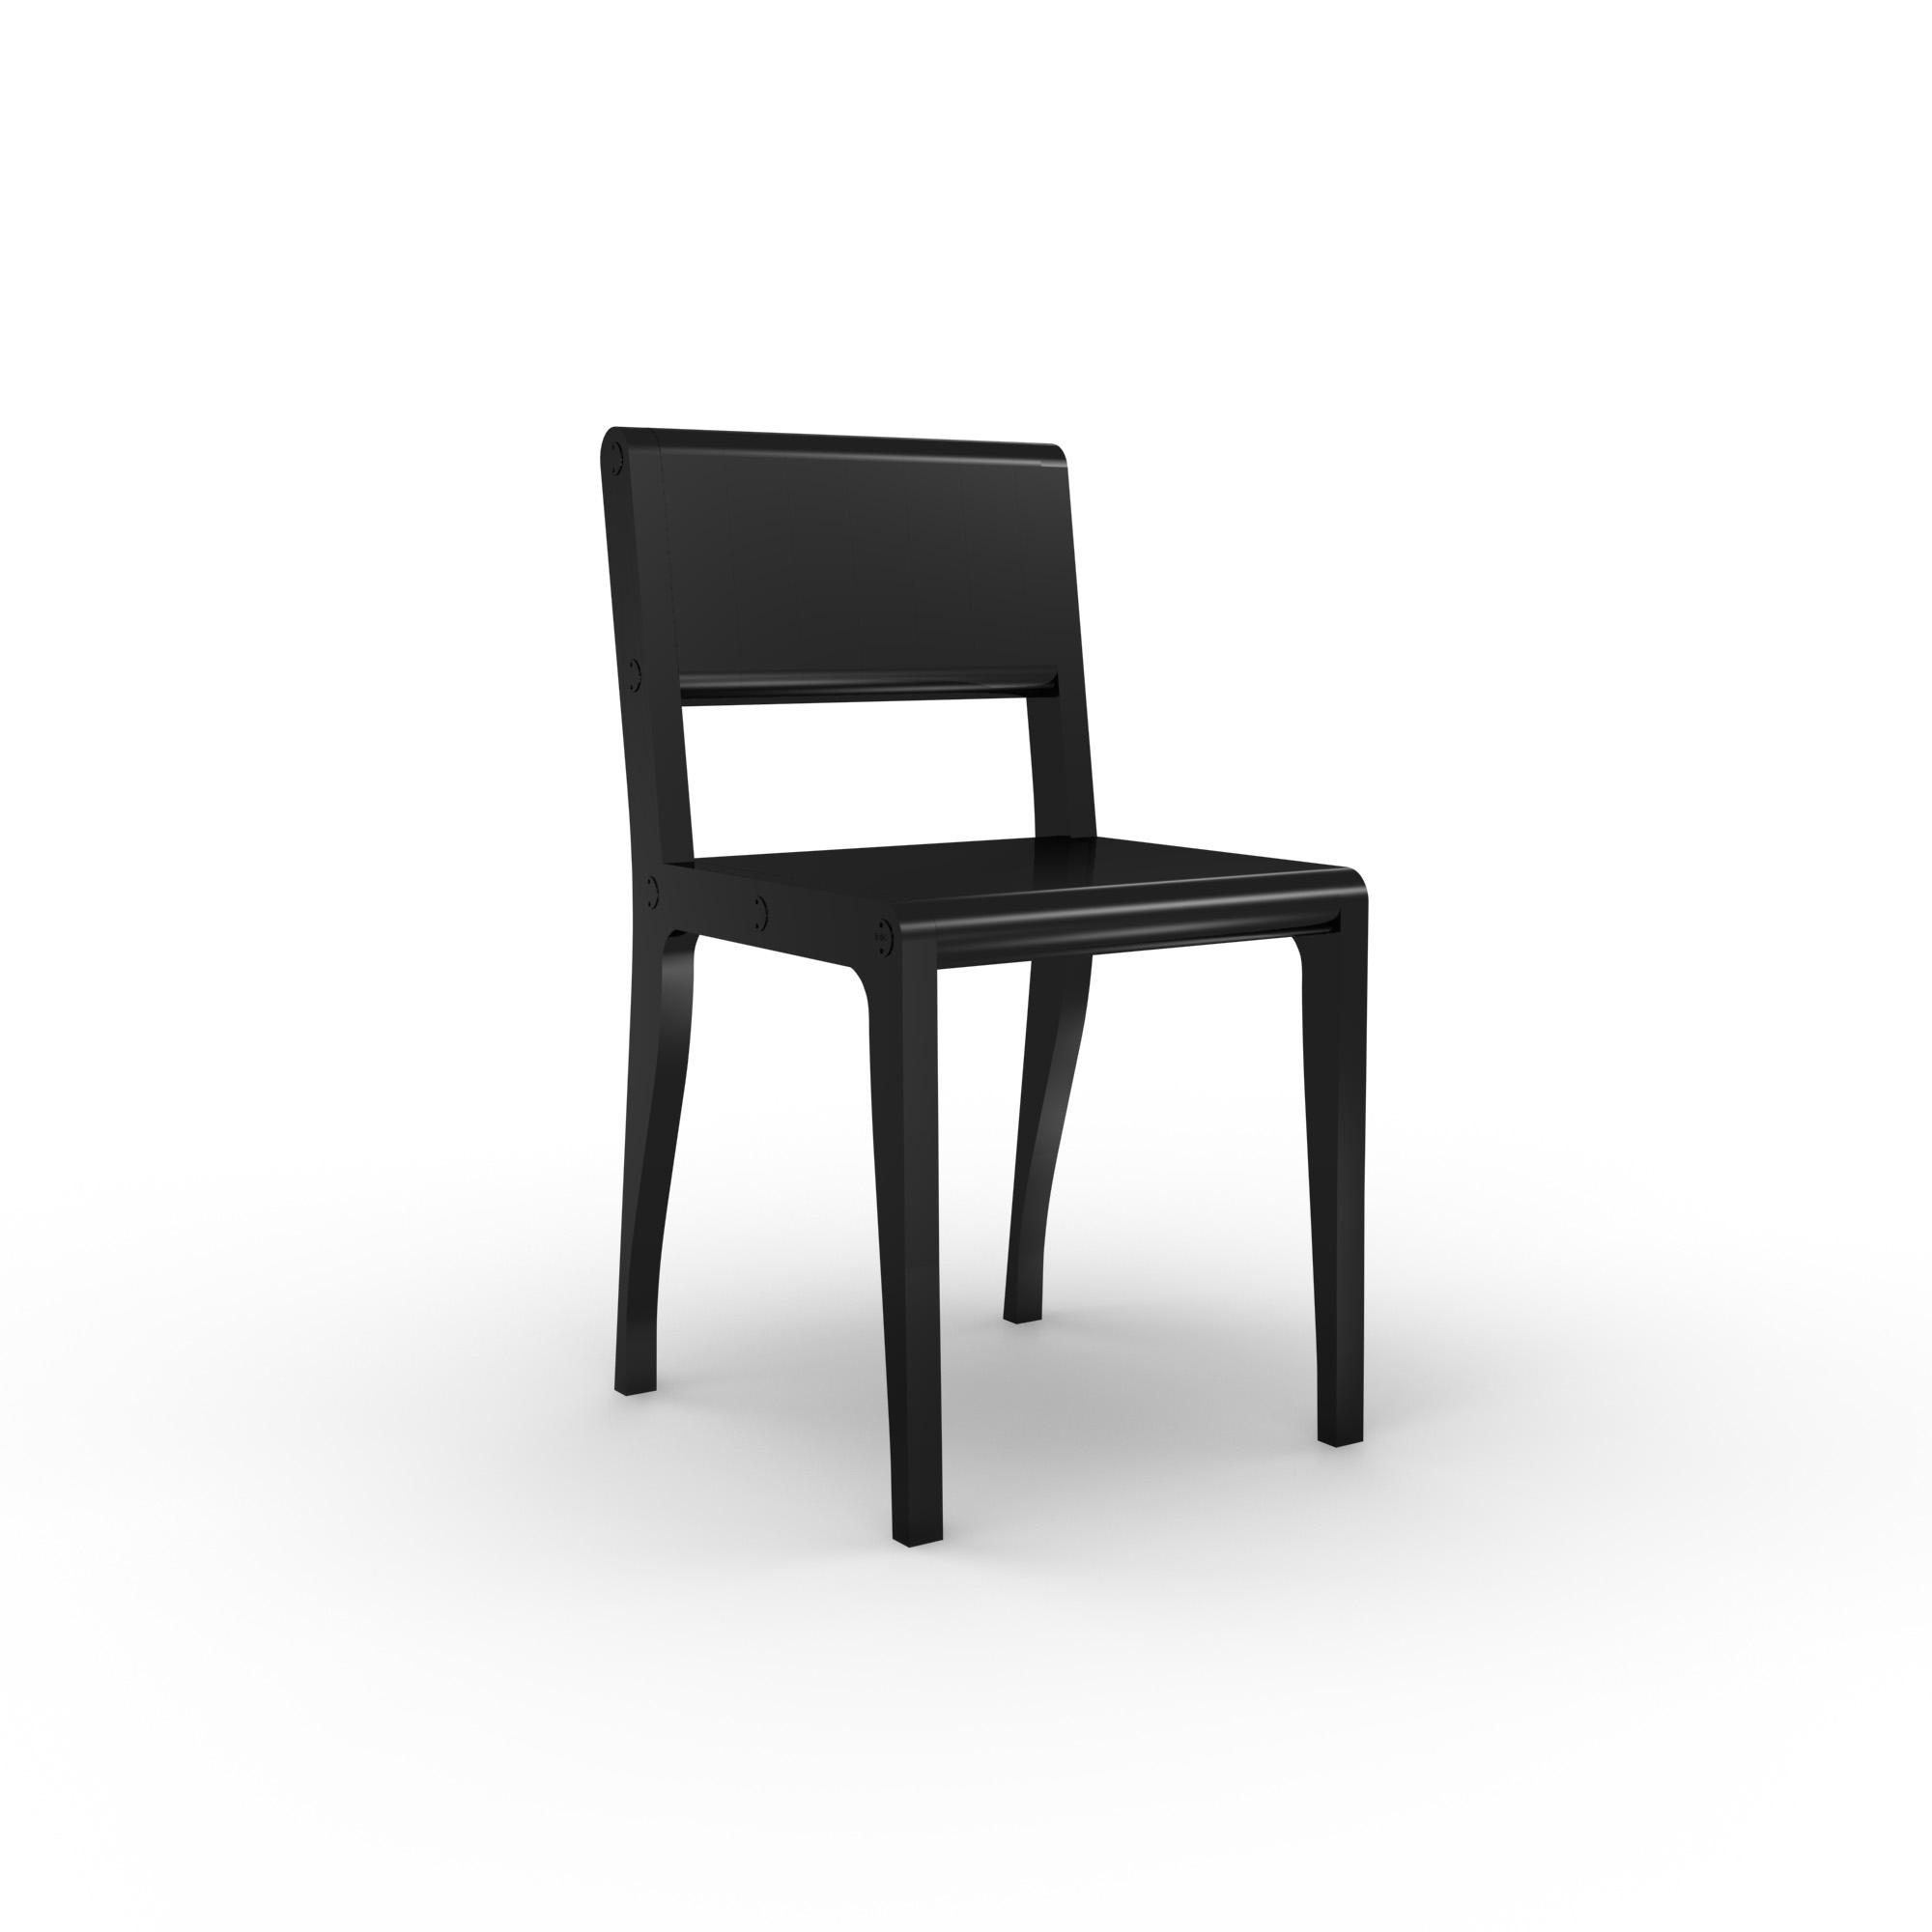 diseño industrial santander - Beusual - Sirak - silla black